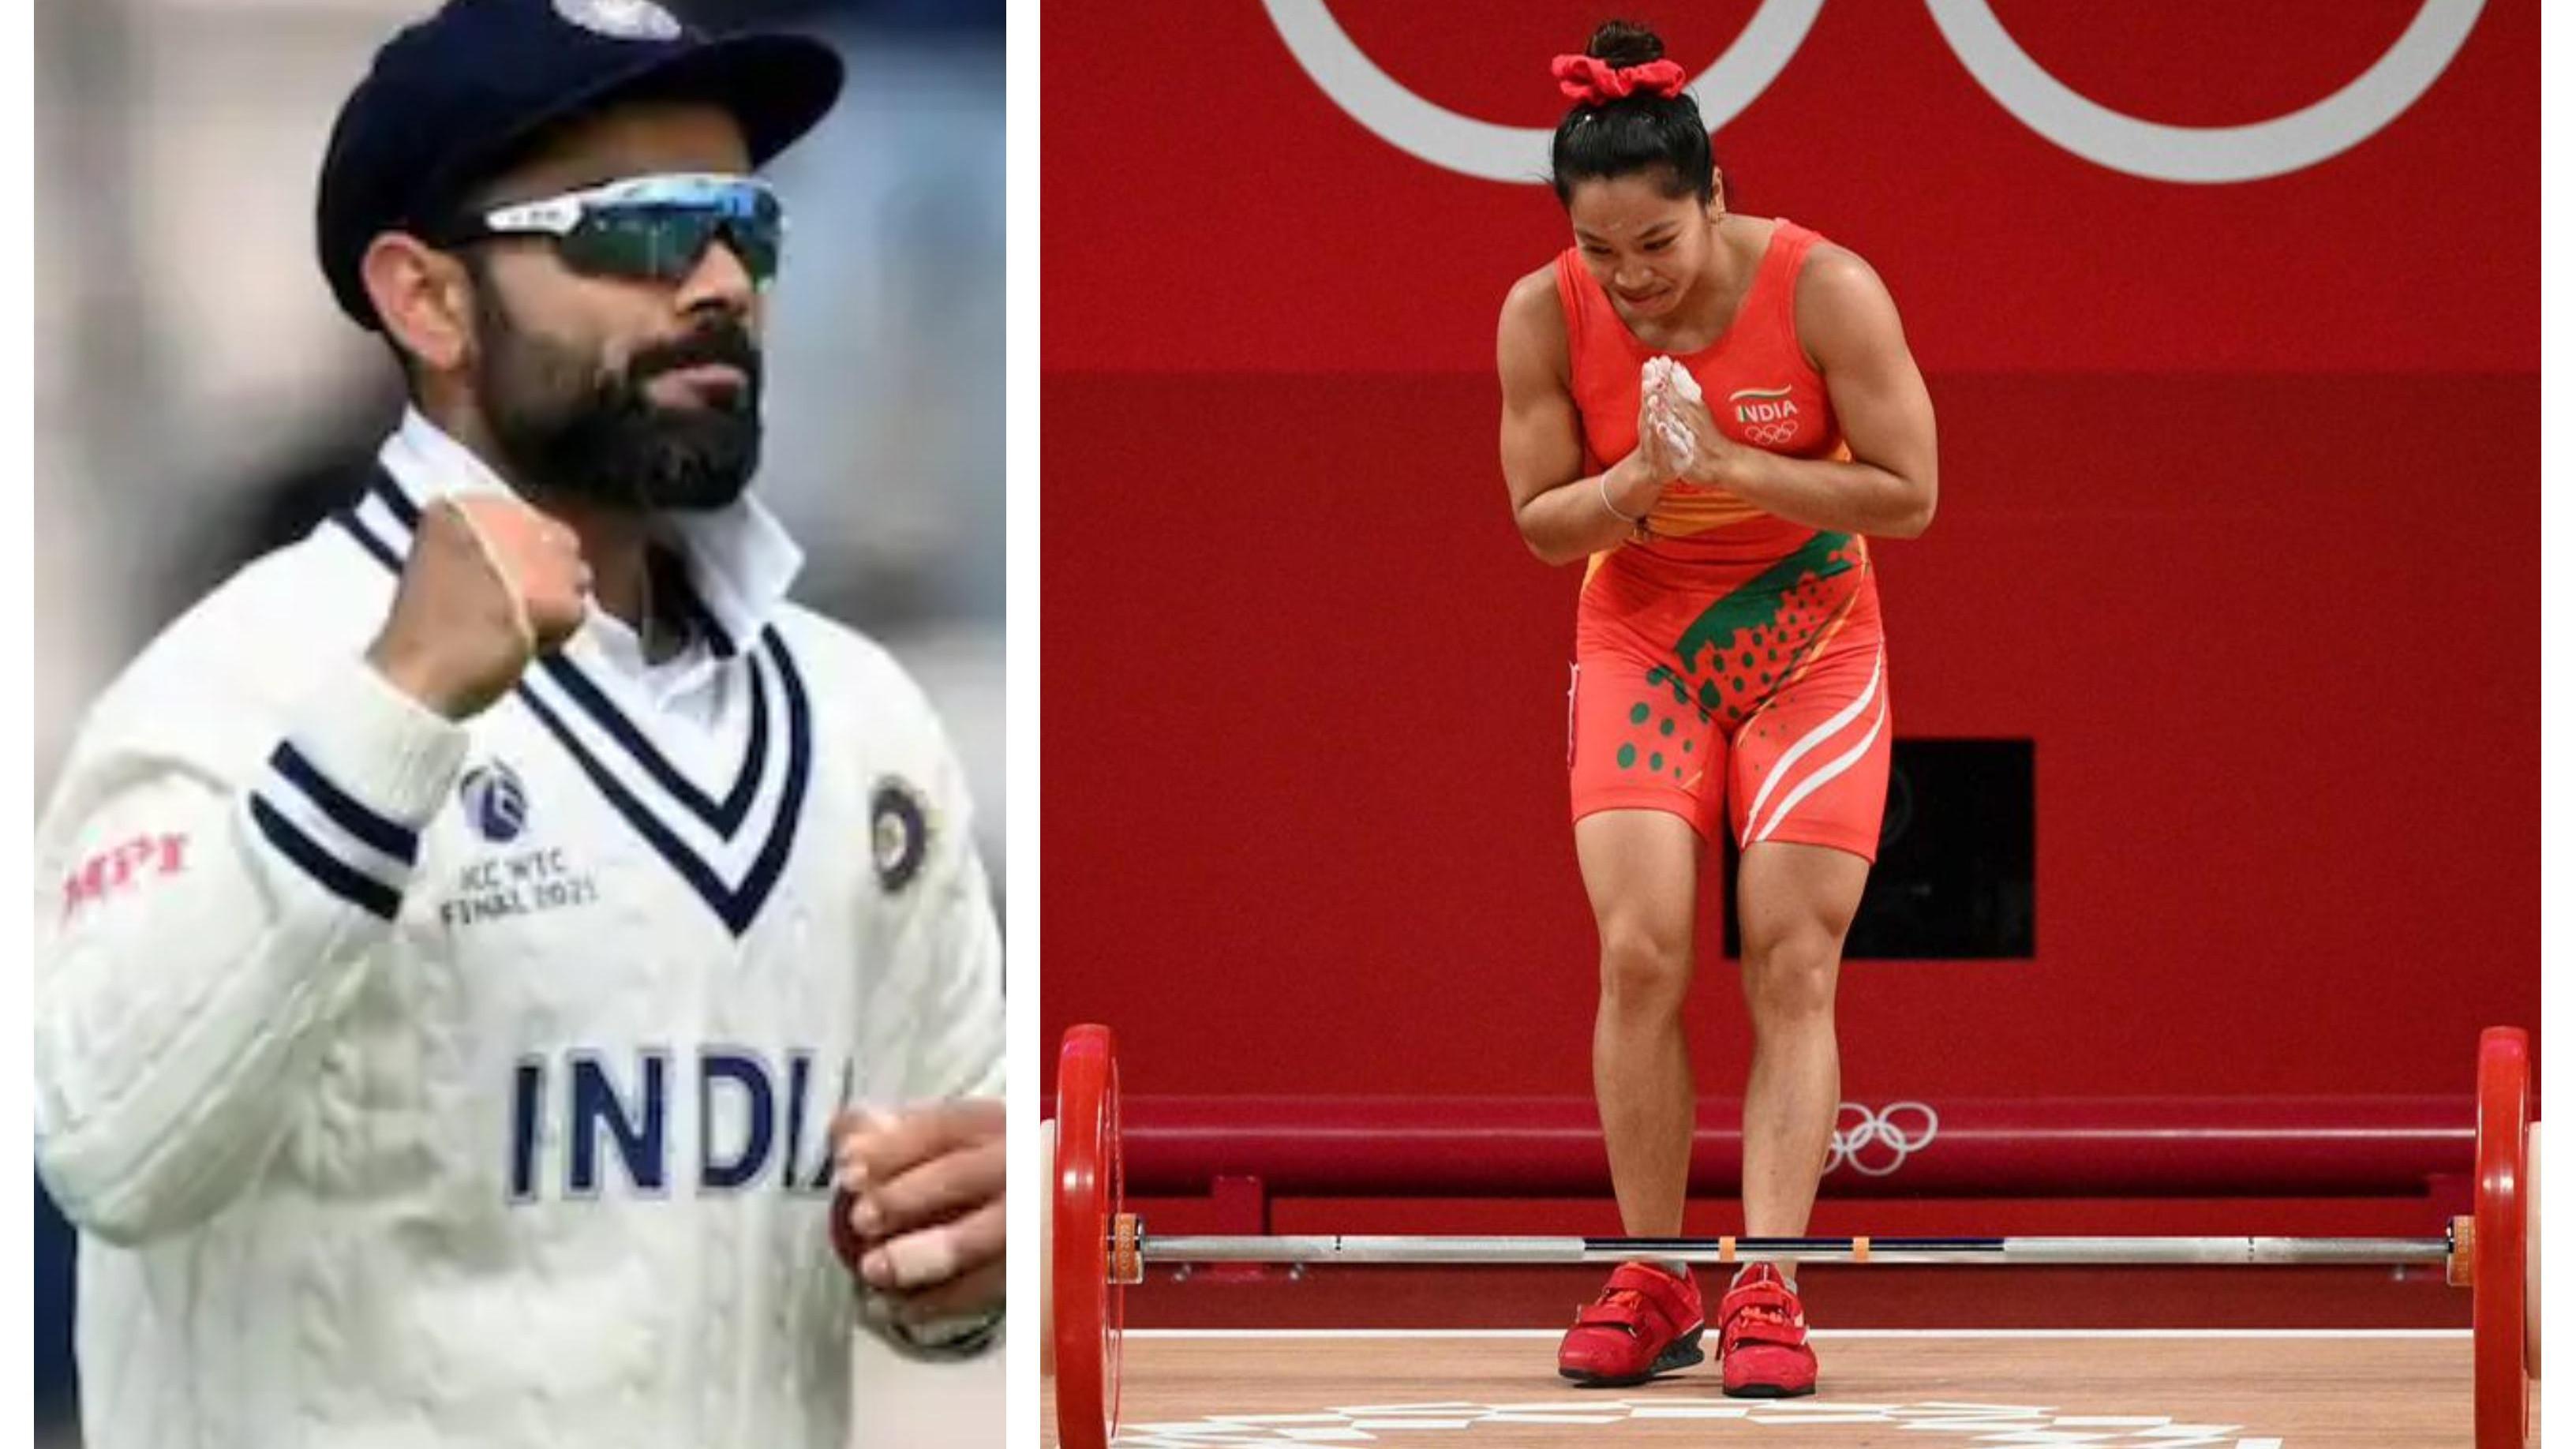 Virat Kohli lauds Mirabai Chanu for winning India its first medal at the 2020 Tokyo Olympics